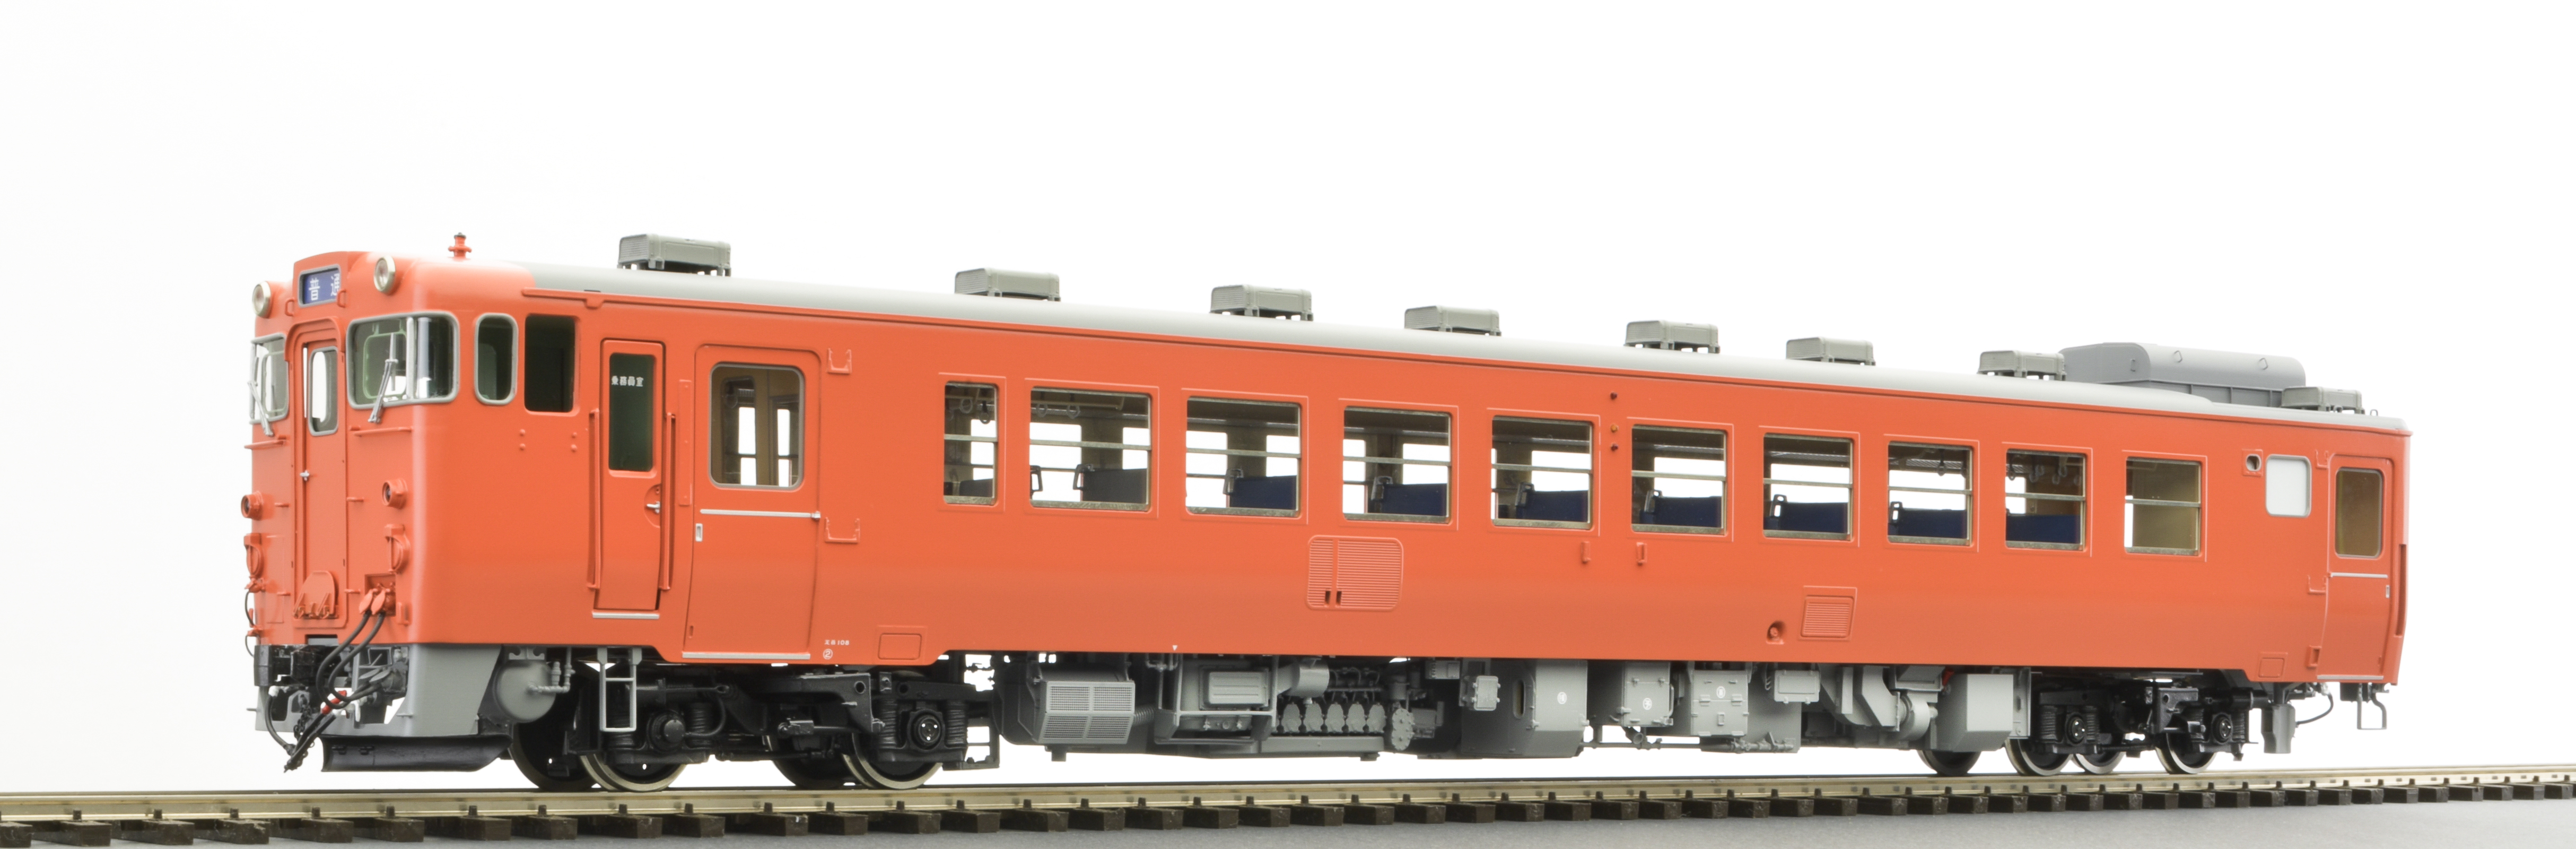 国鉄キハ48形 気動車500番台